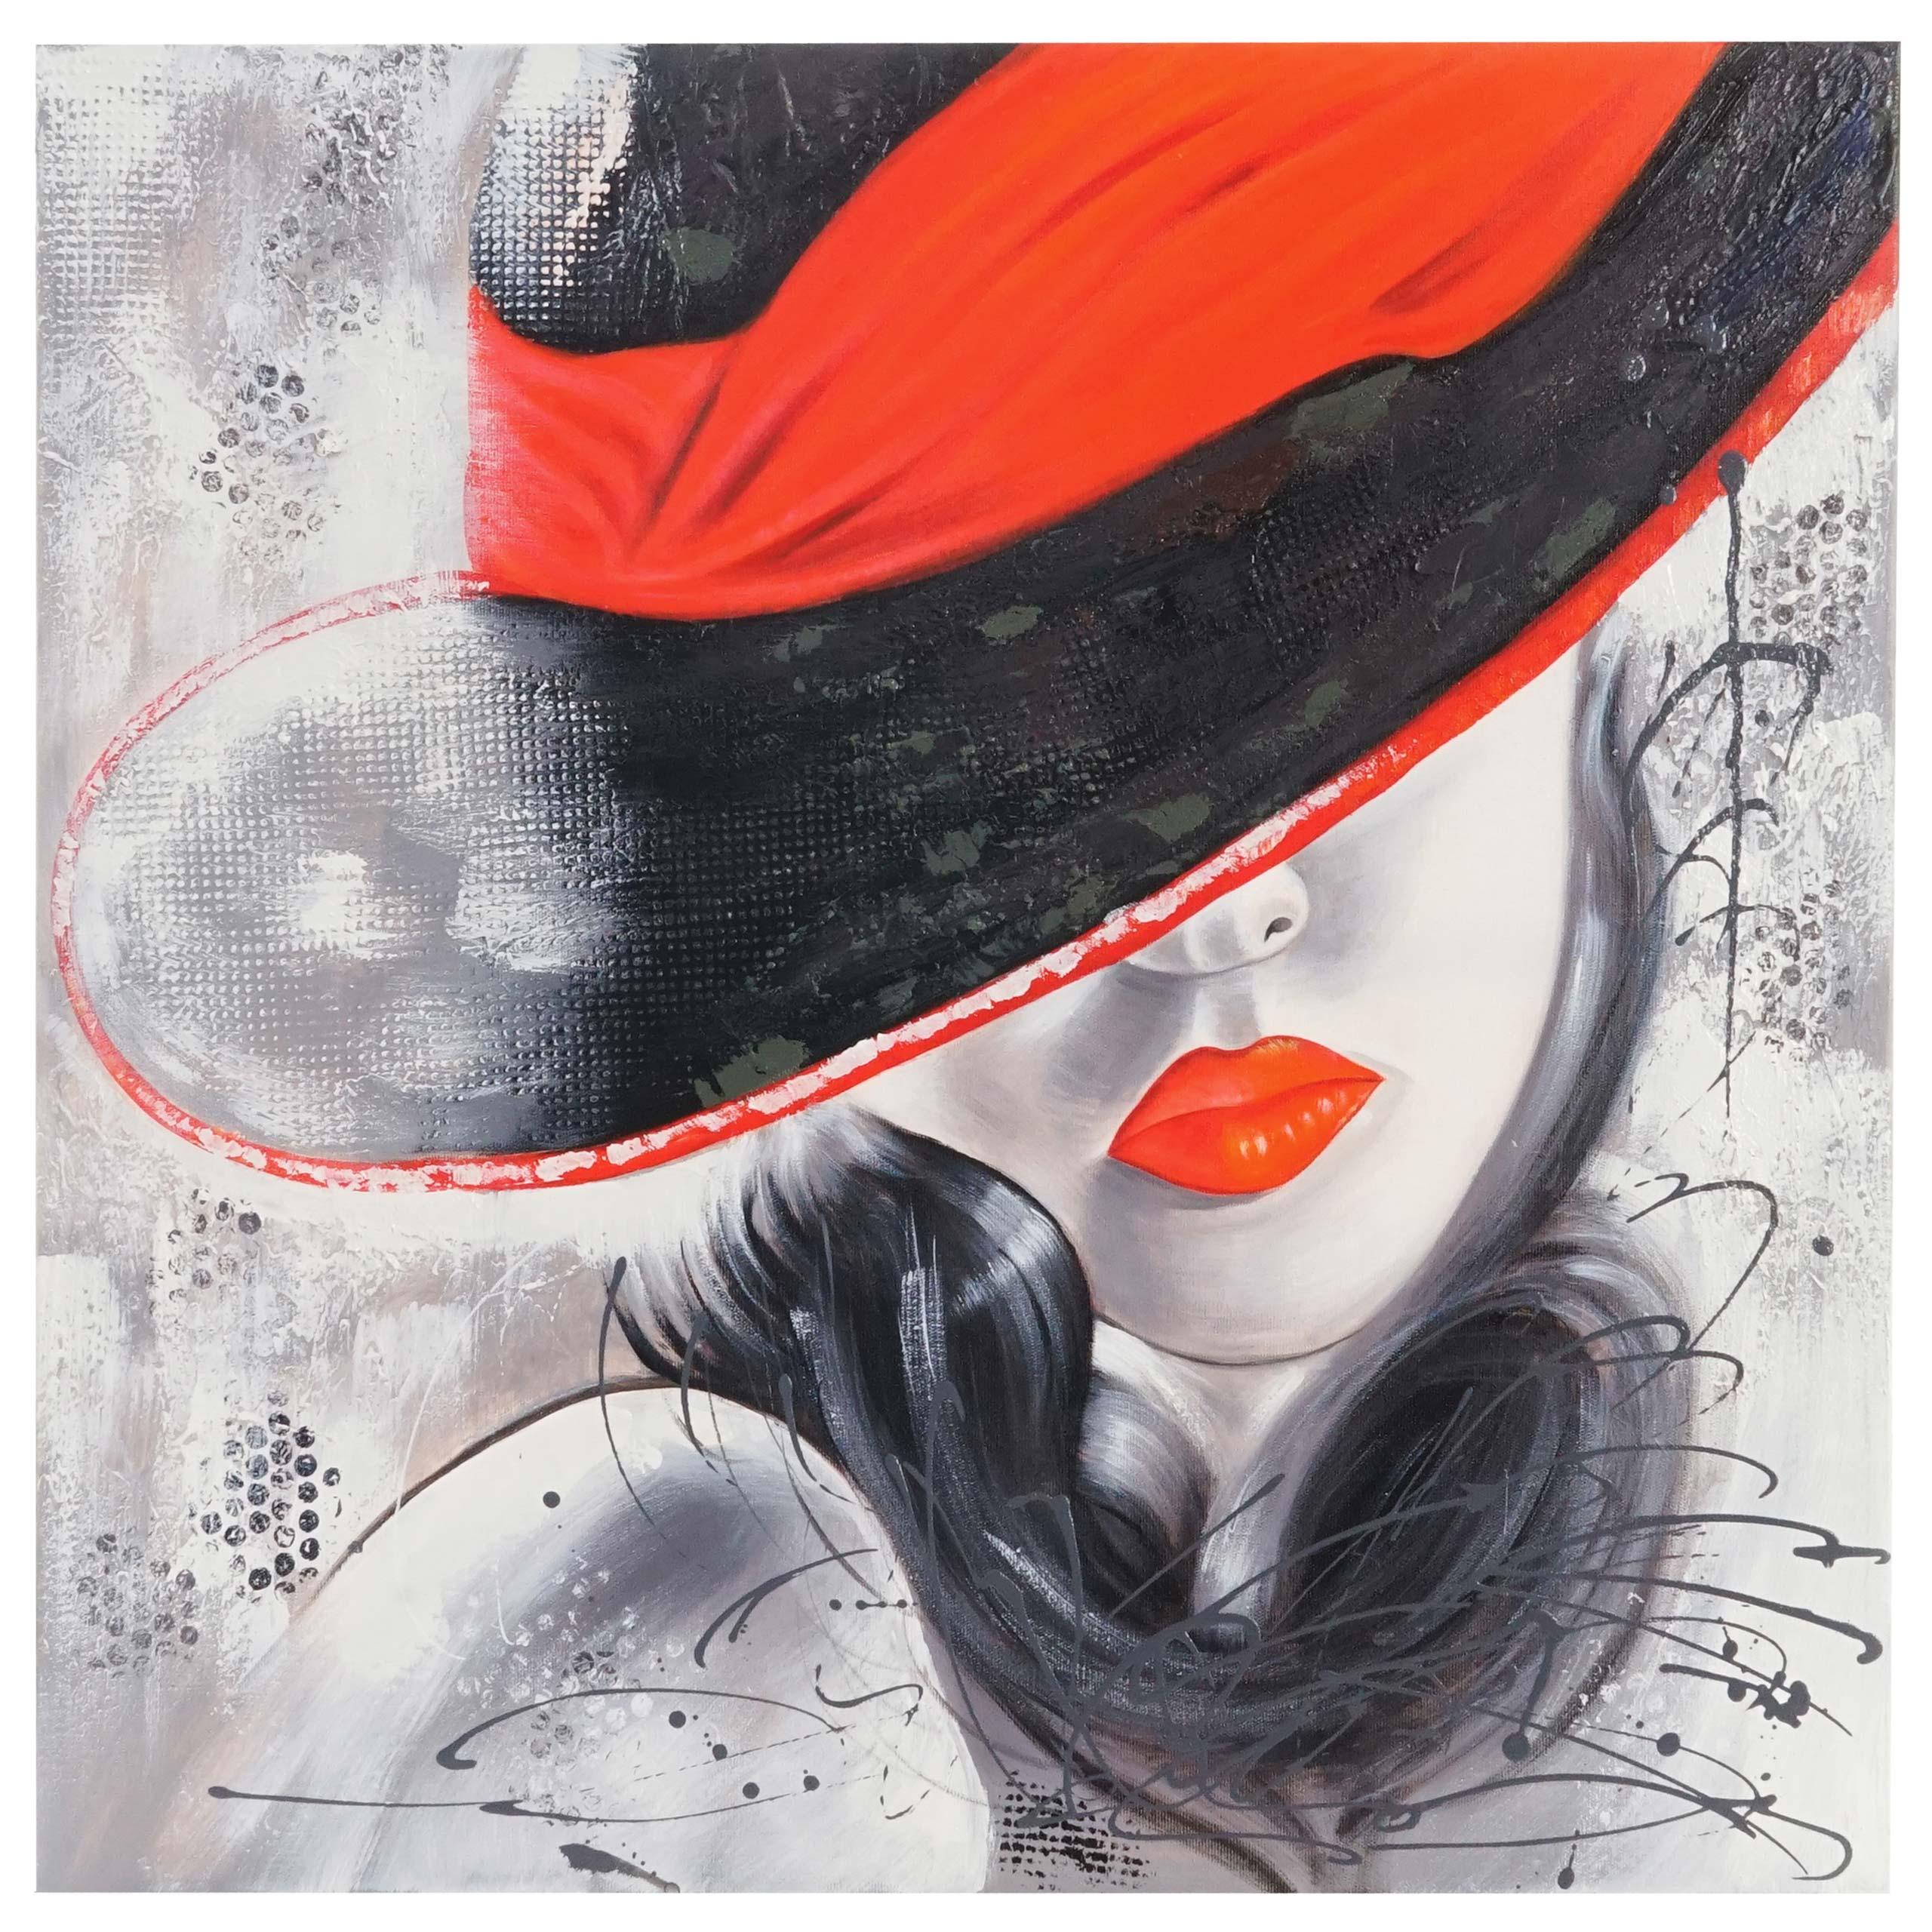 Mendler Ölgemälde Lady, 100% handgemaltes Wandbild Gemälde XL, 80x80cm ~ Variantenangebot 44723